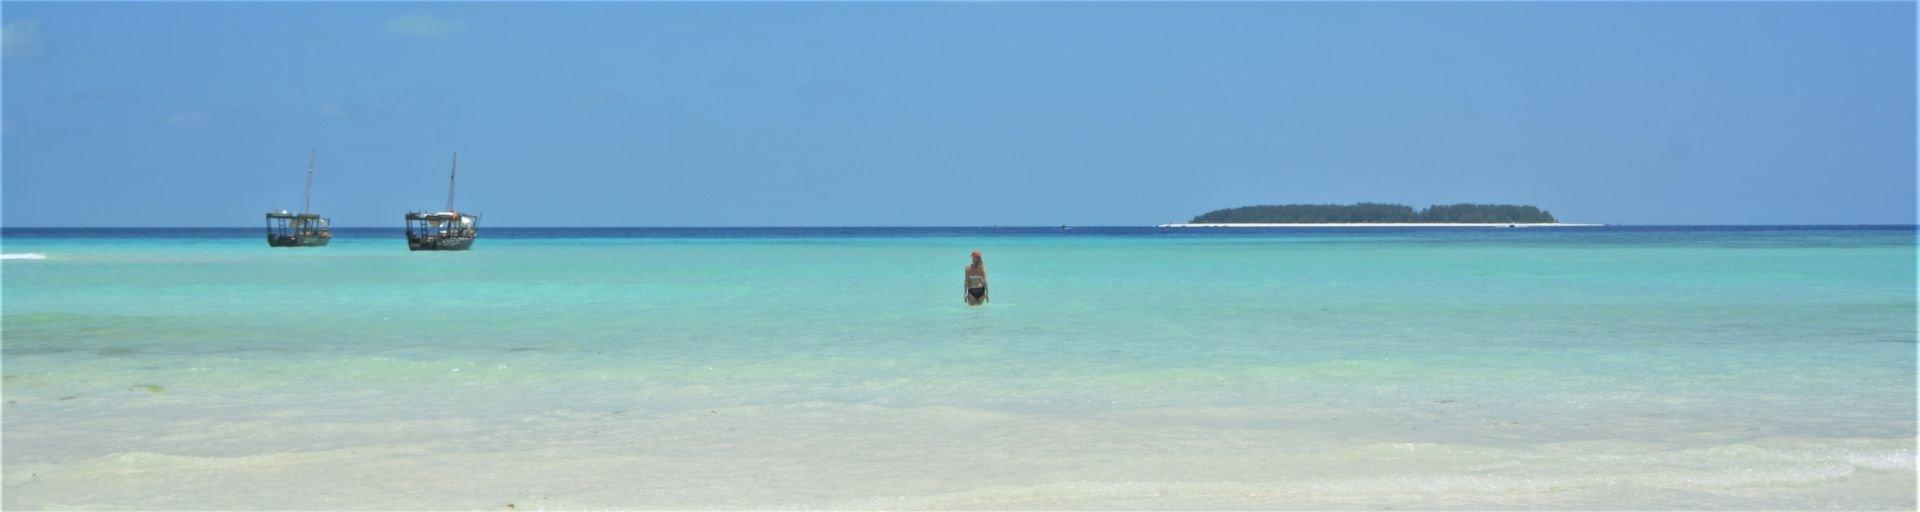 Mnemba Island - Zanzibar - Distance - Stu Jarvis